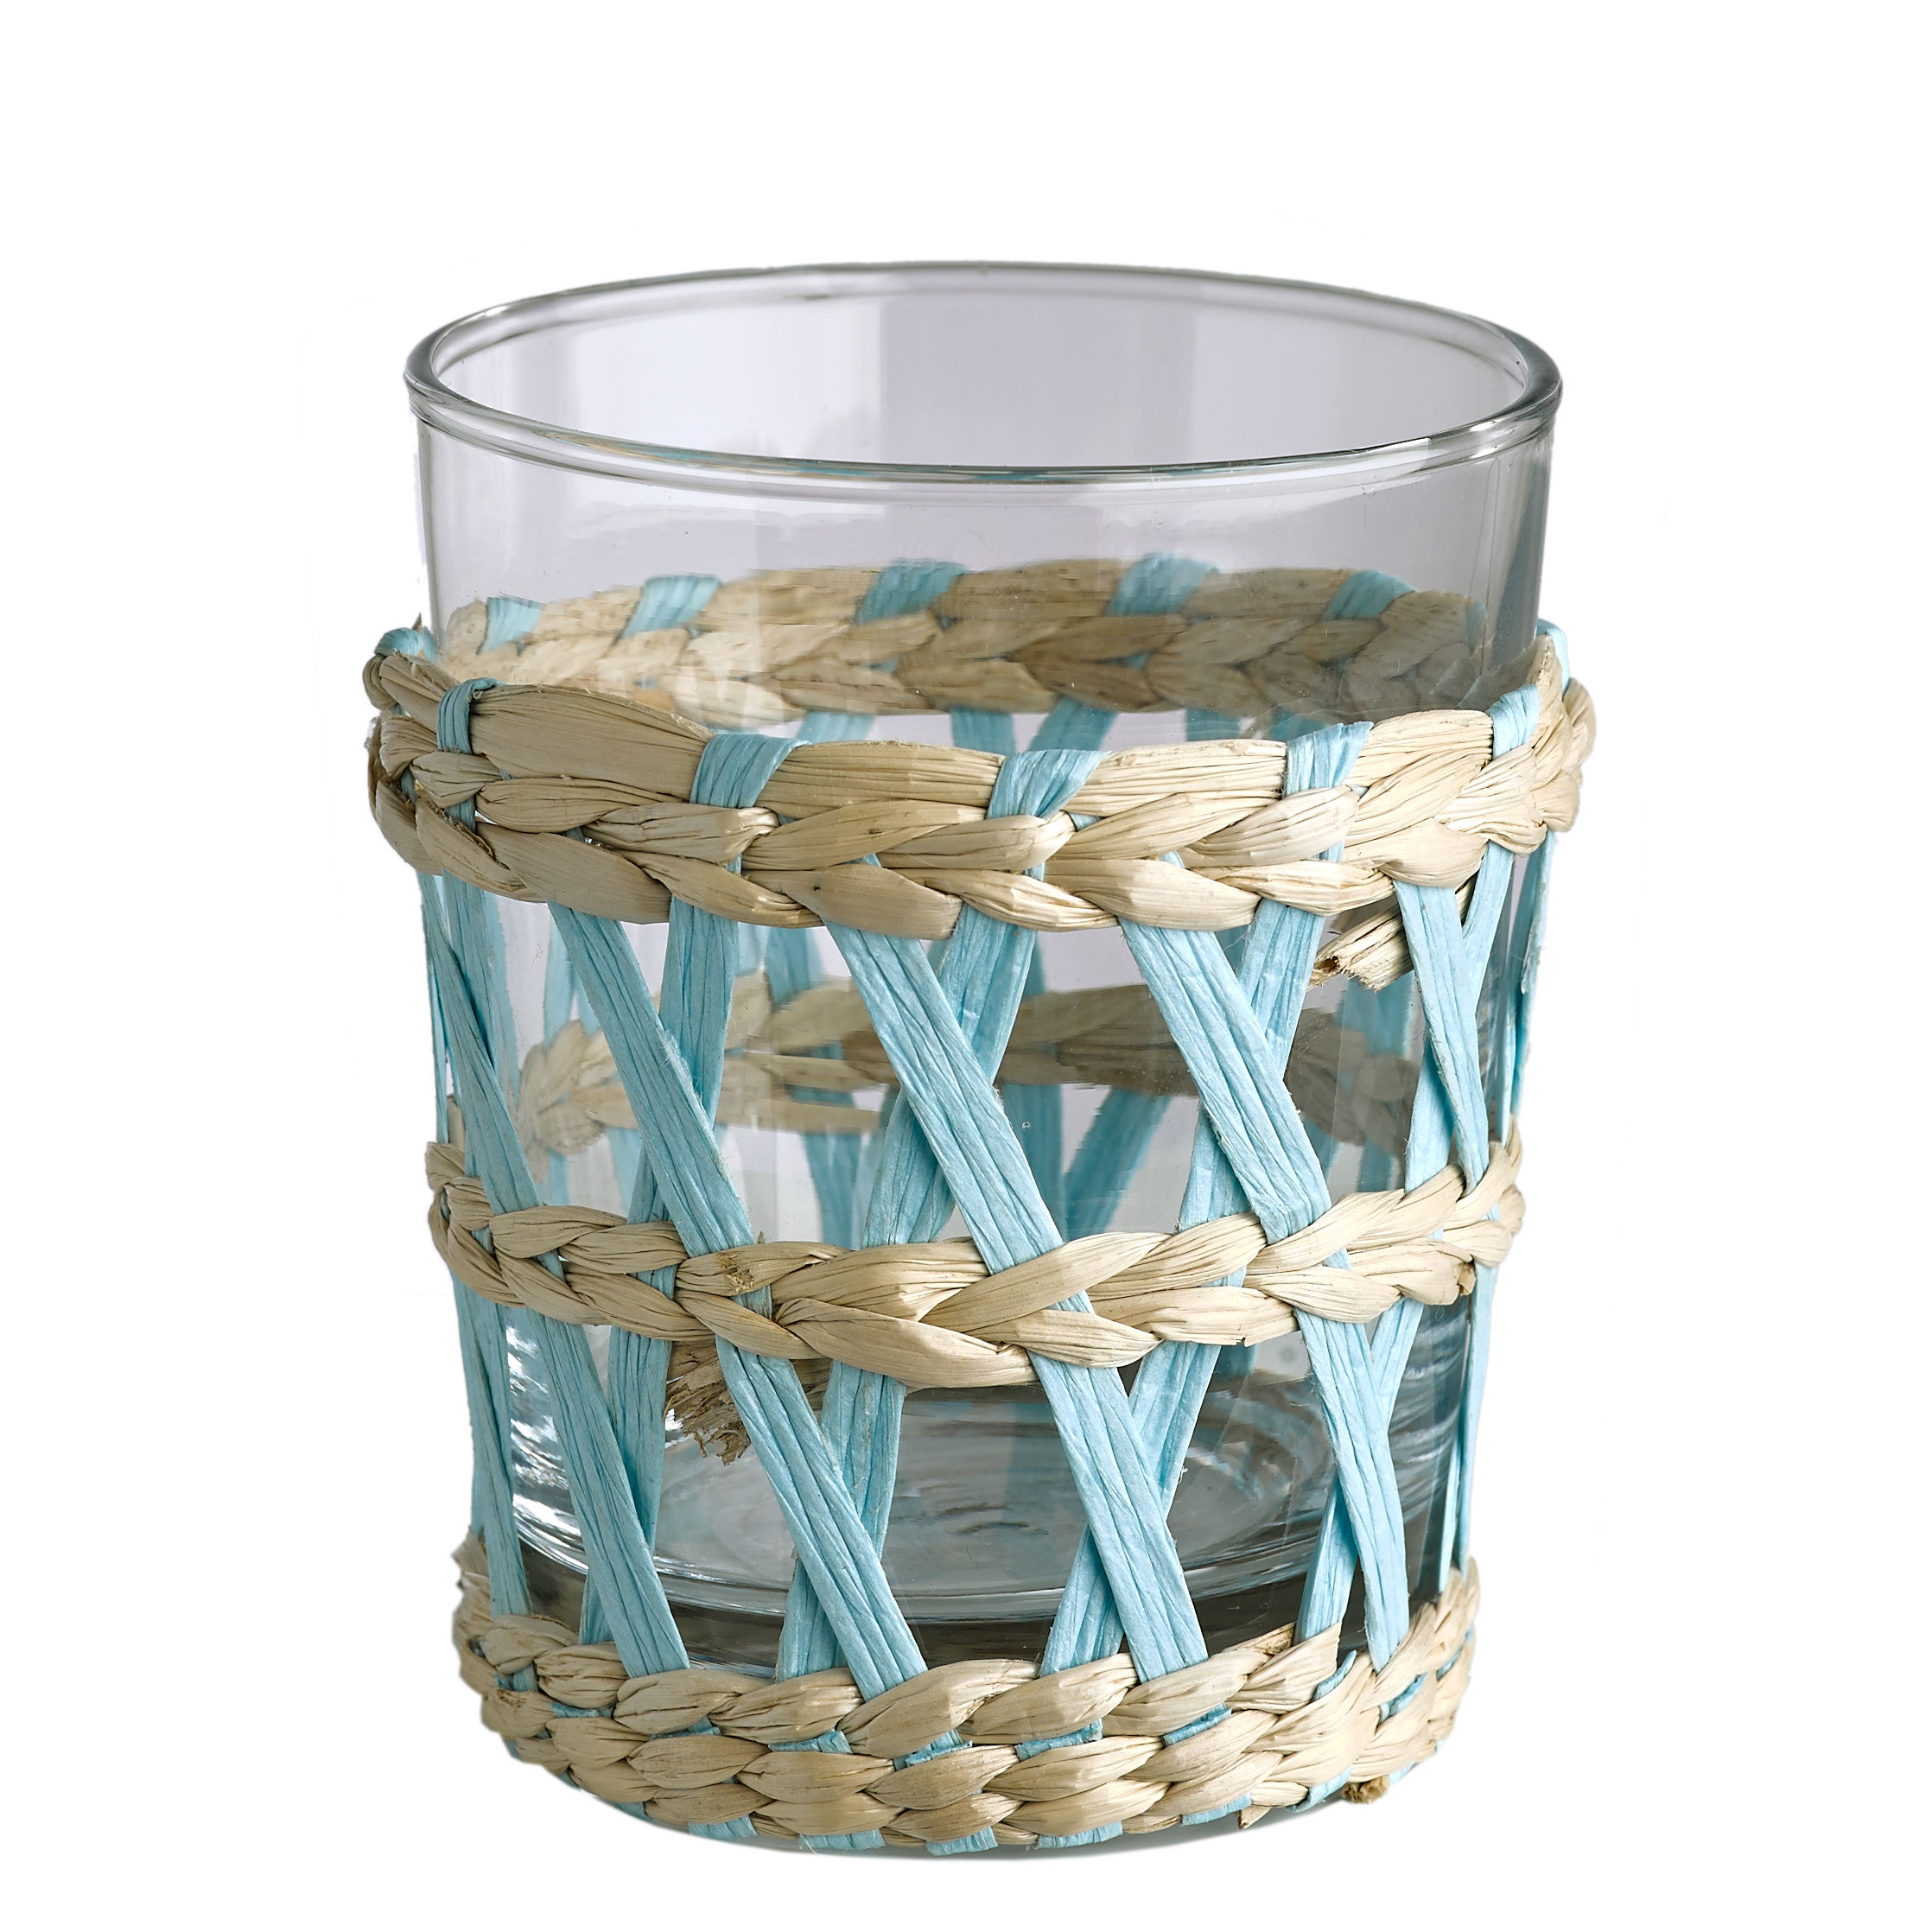 verre eau reed set de 6 verre osier osier color transparent pols potten. Black Bedroom Furniture Sets. Home Design Ideas